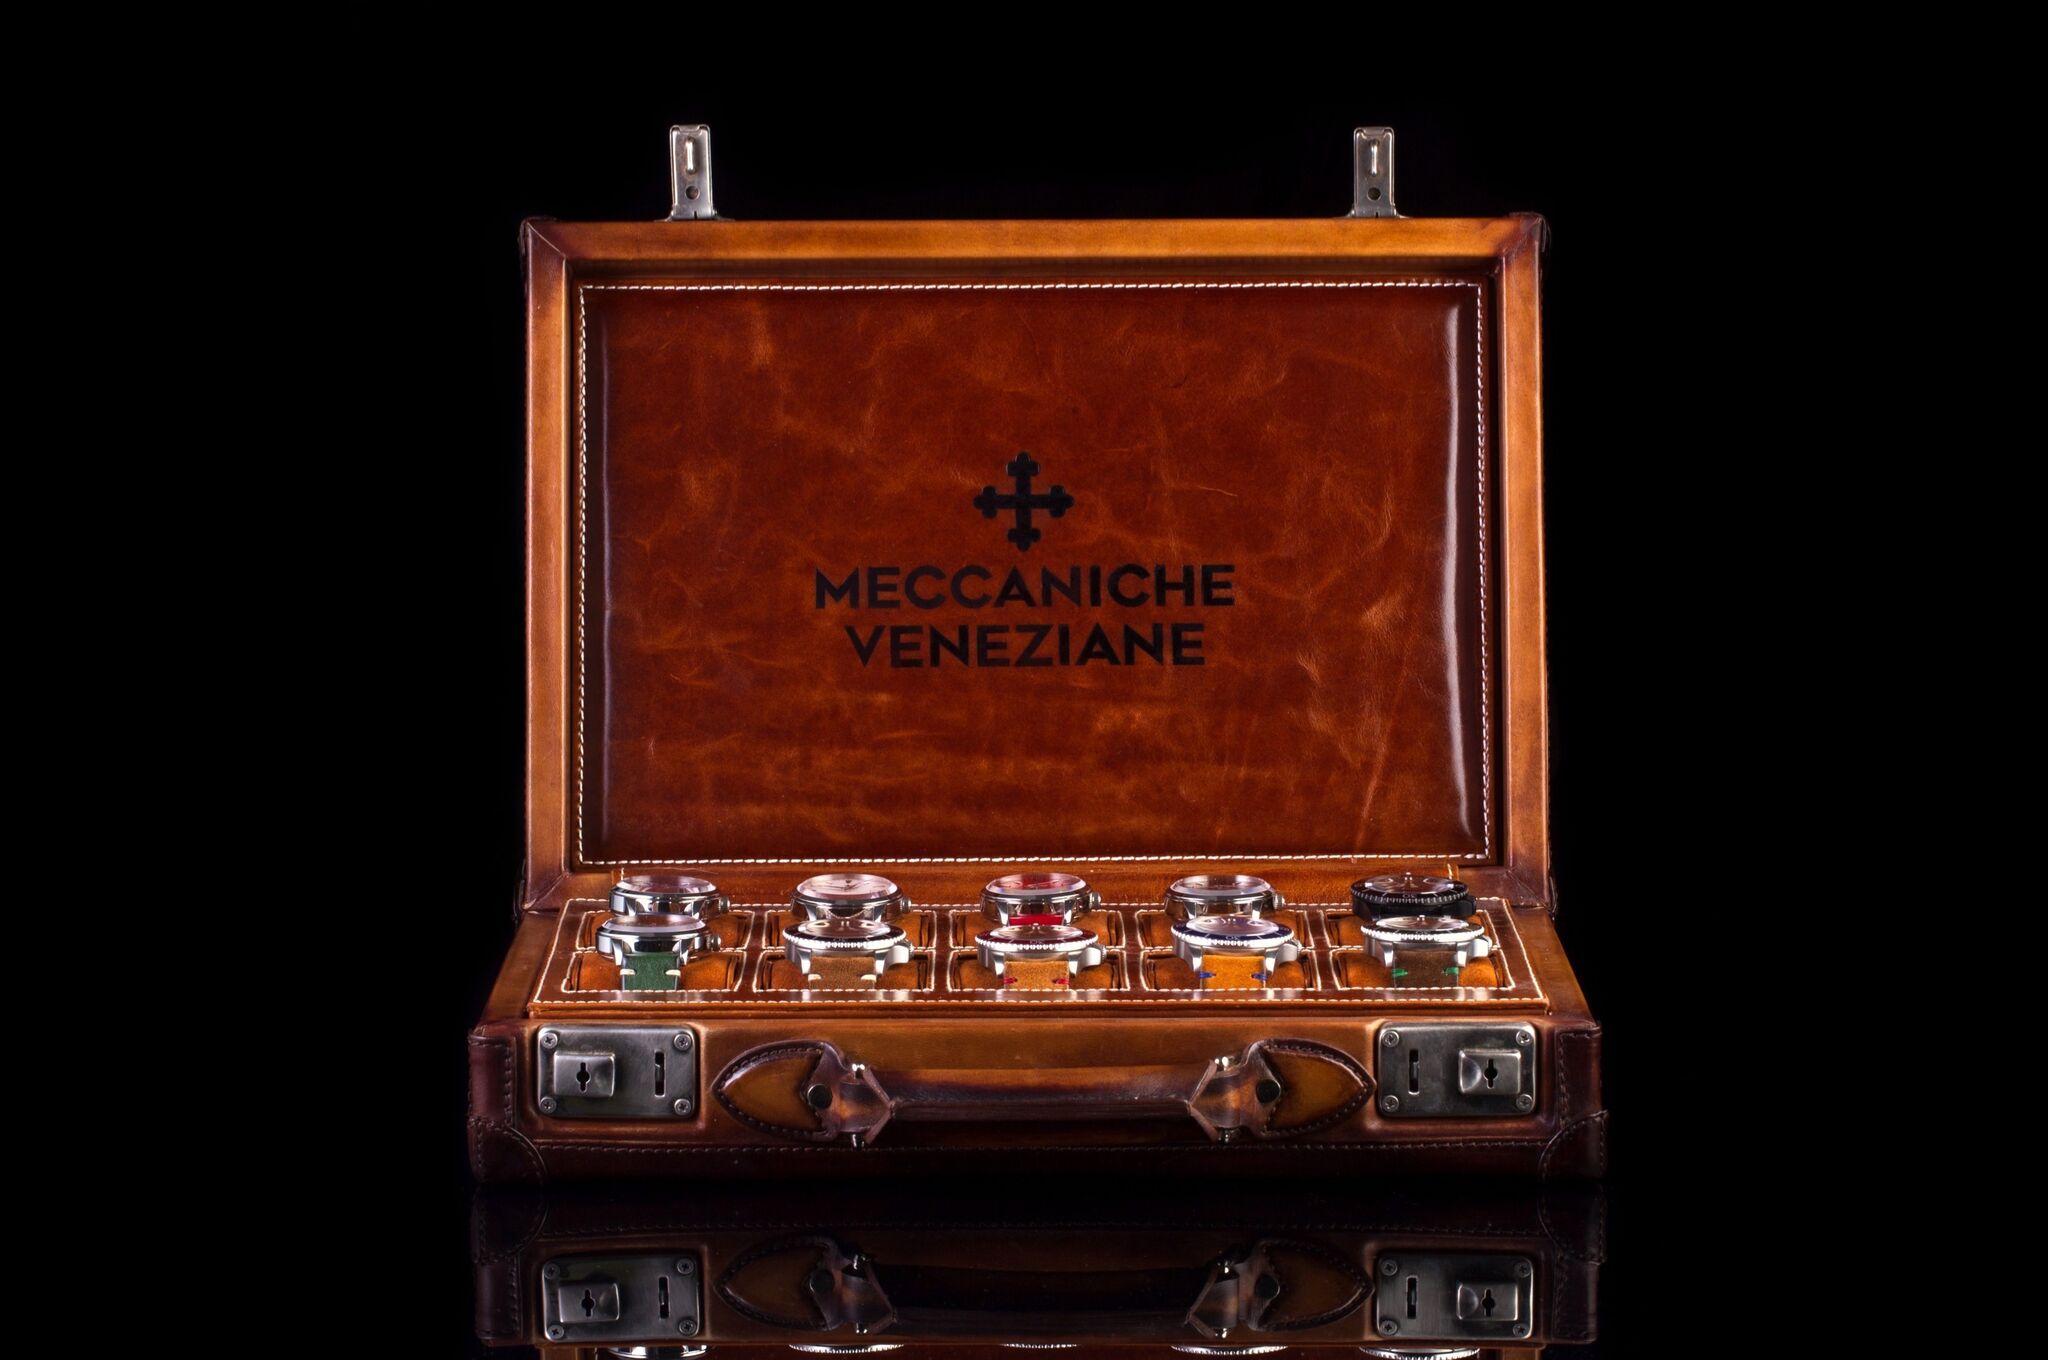 Meccaniche Veneziane